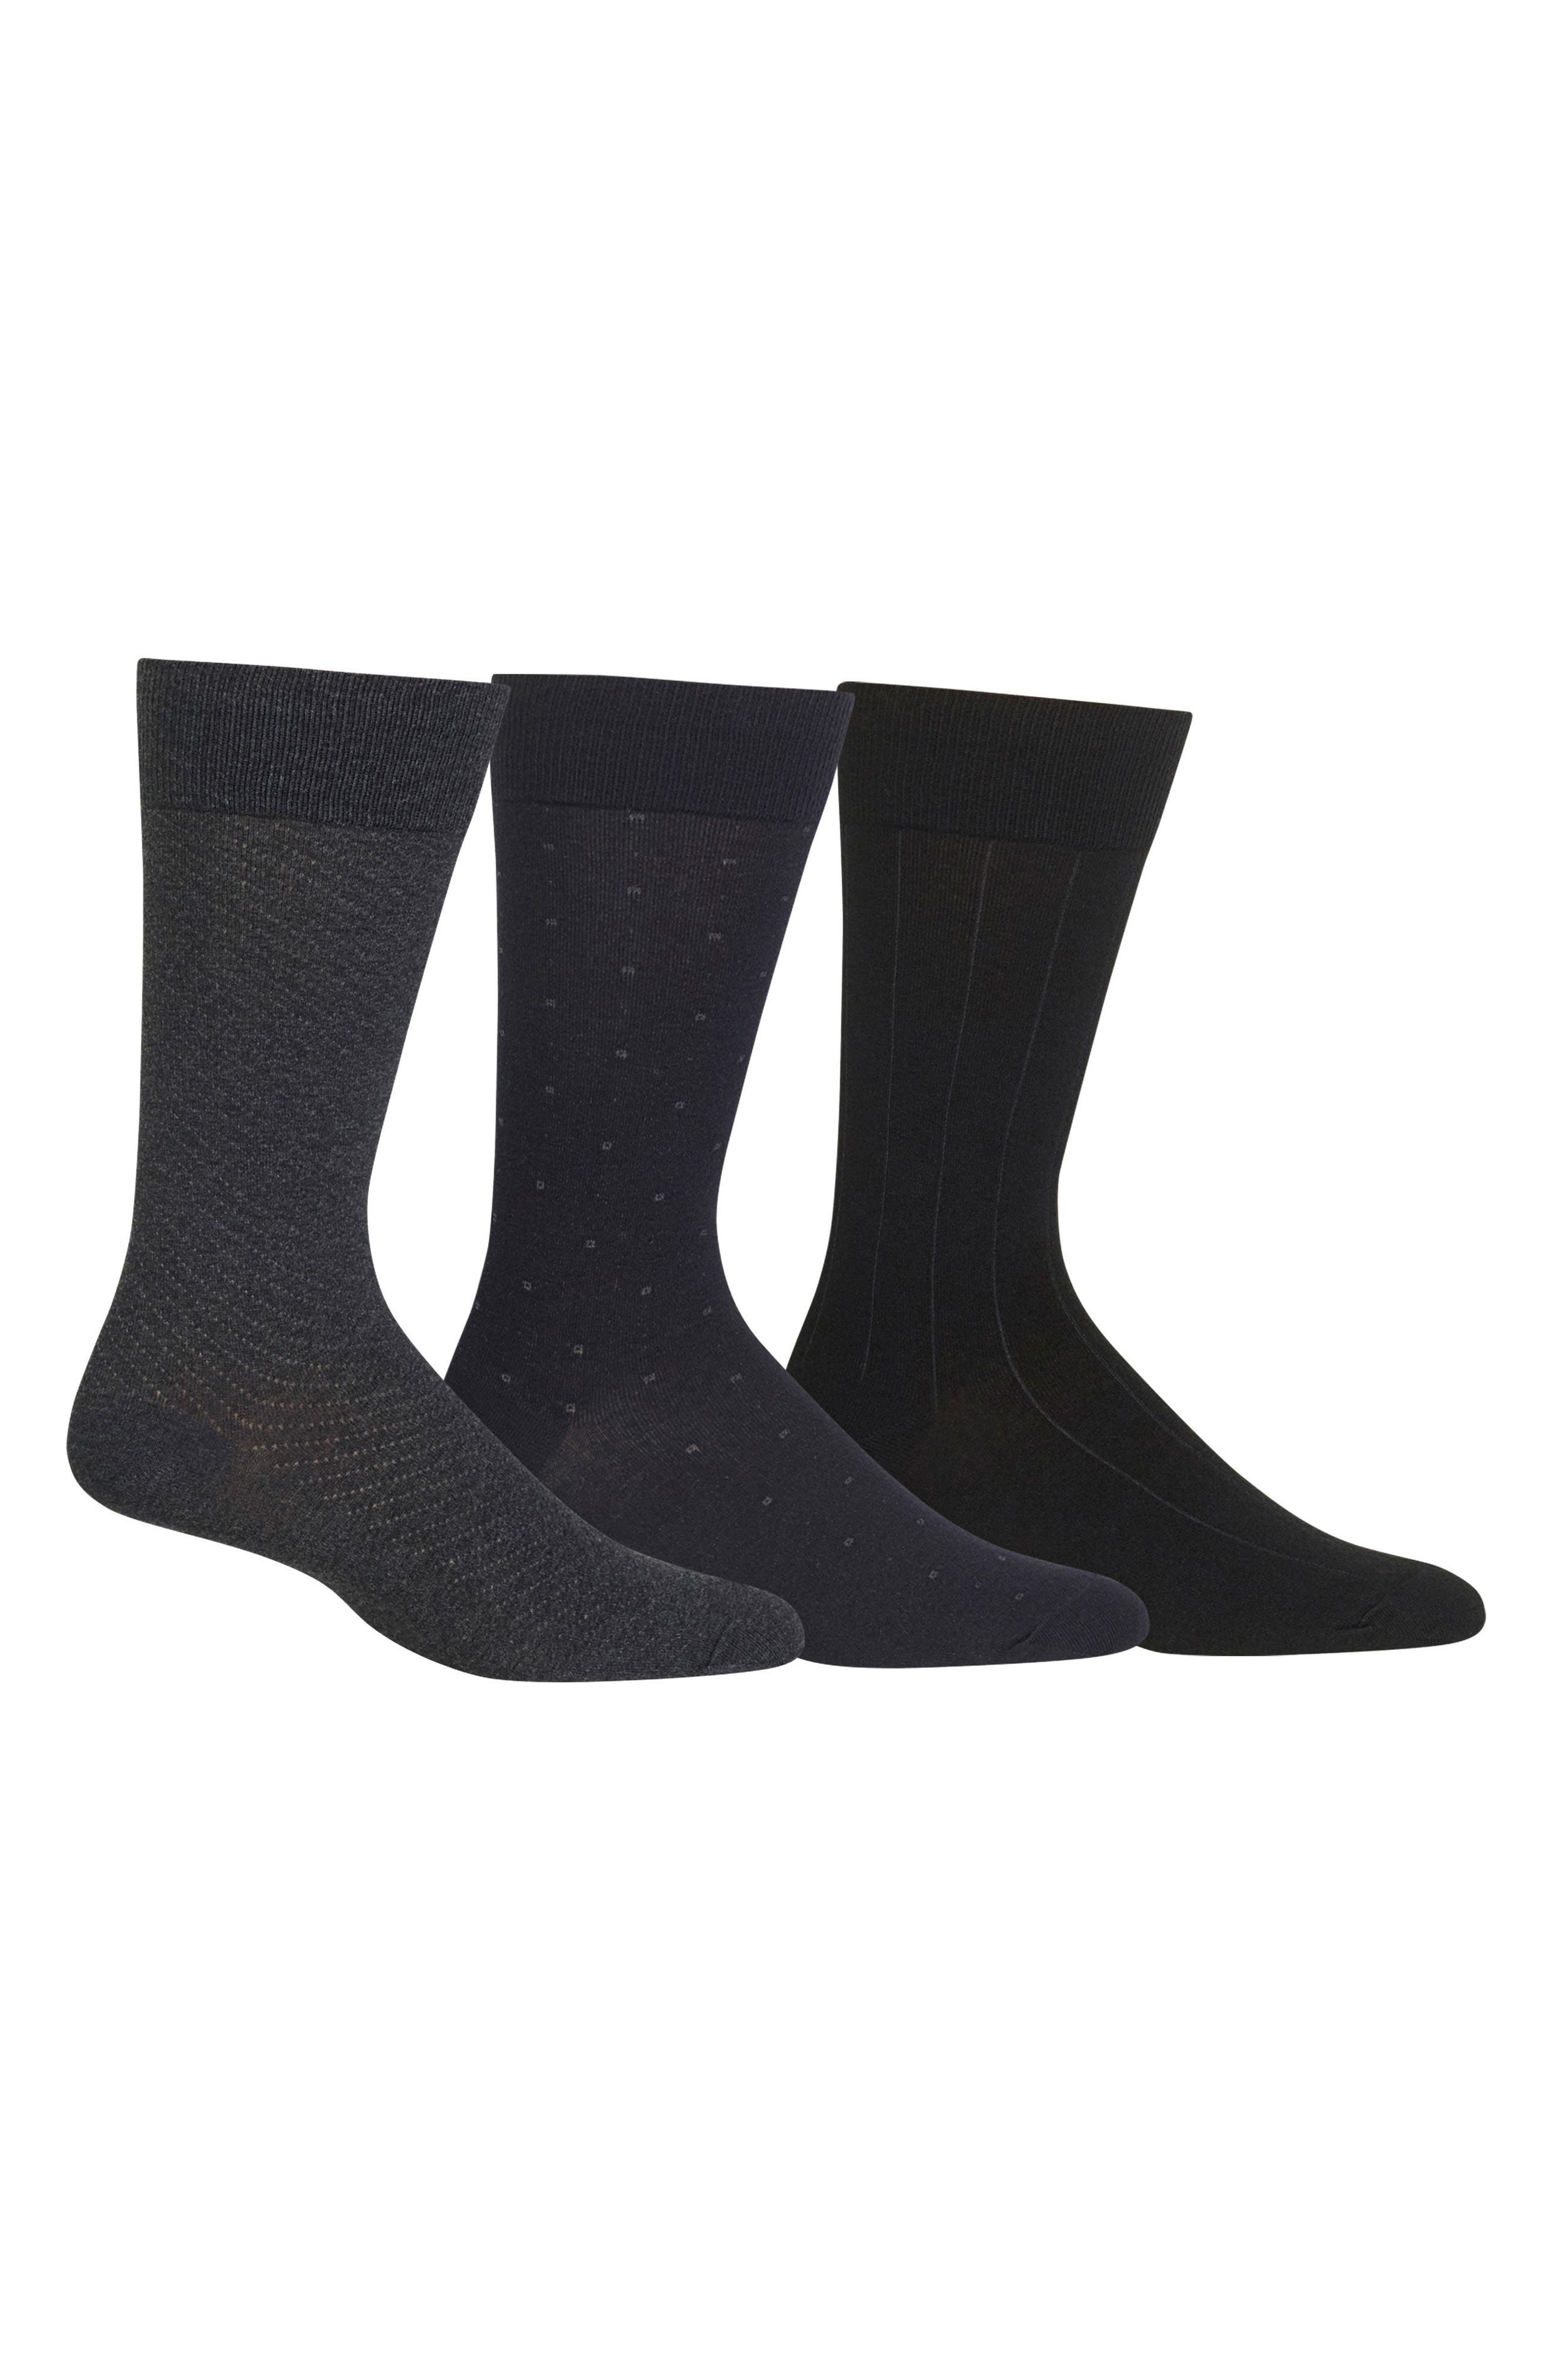 Dress Socks,                             Main thumbnail 1, color,                             Charcoal Heather/ Navy/ Black